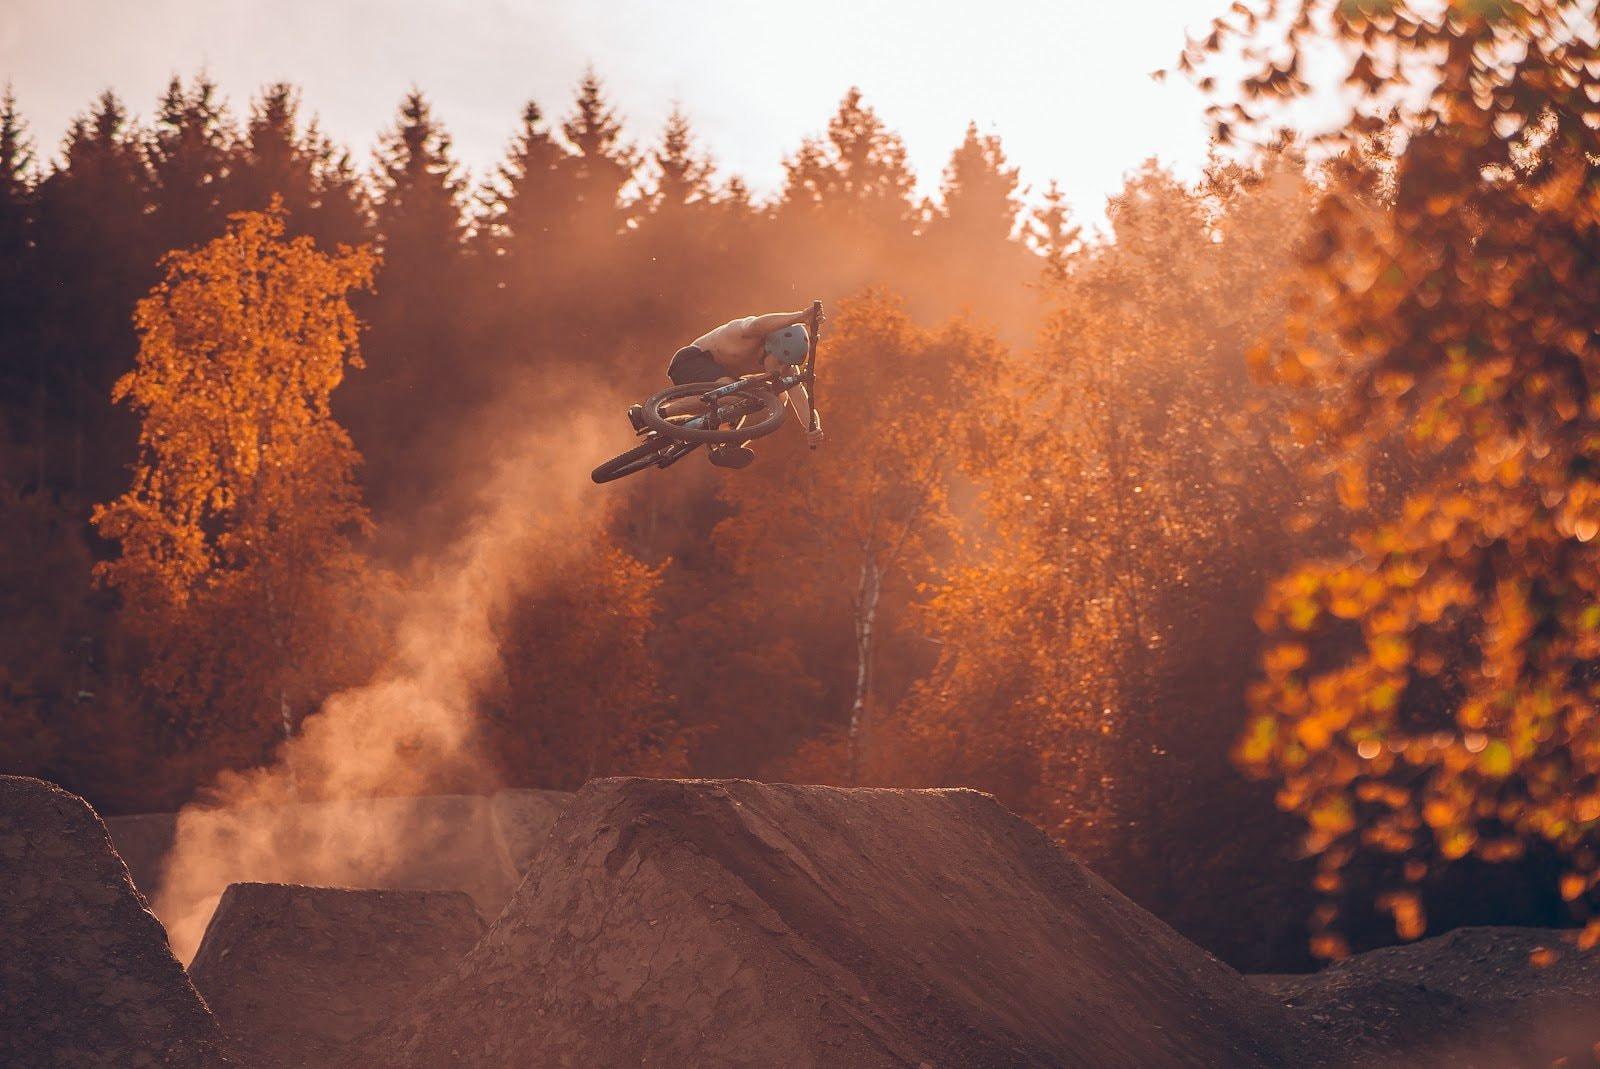 Shot of a biker in the air by David Henrichs